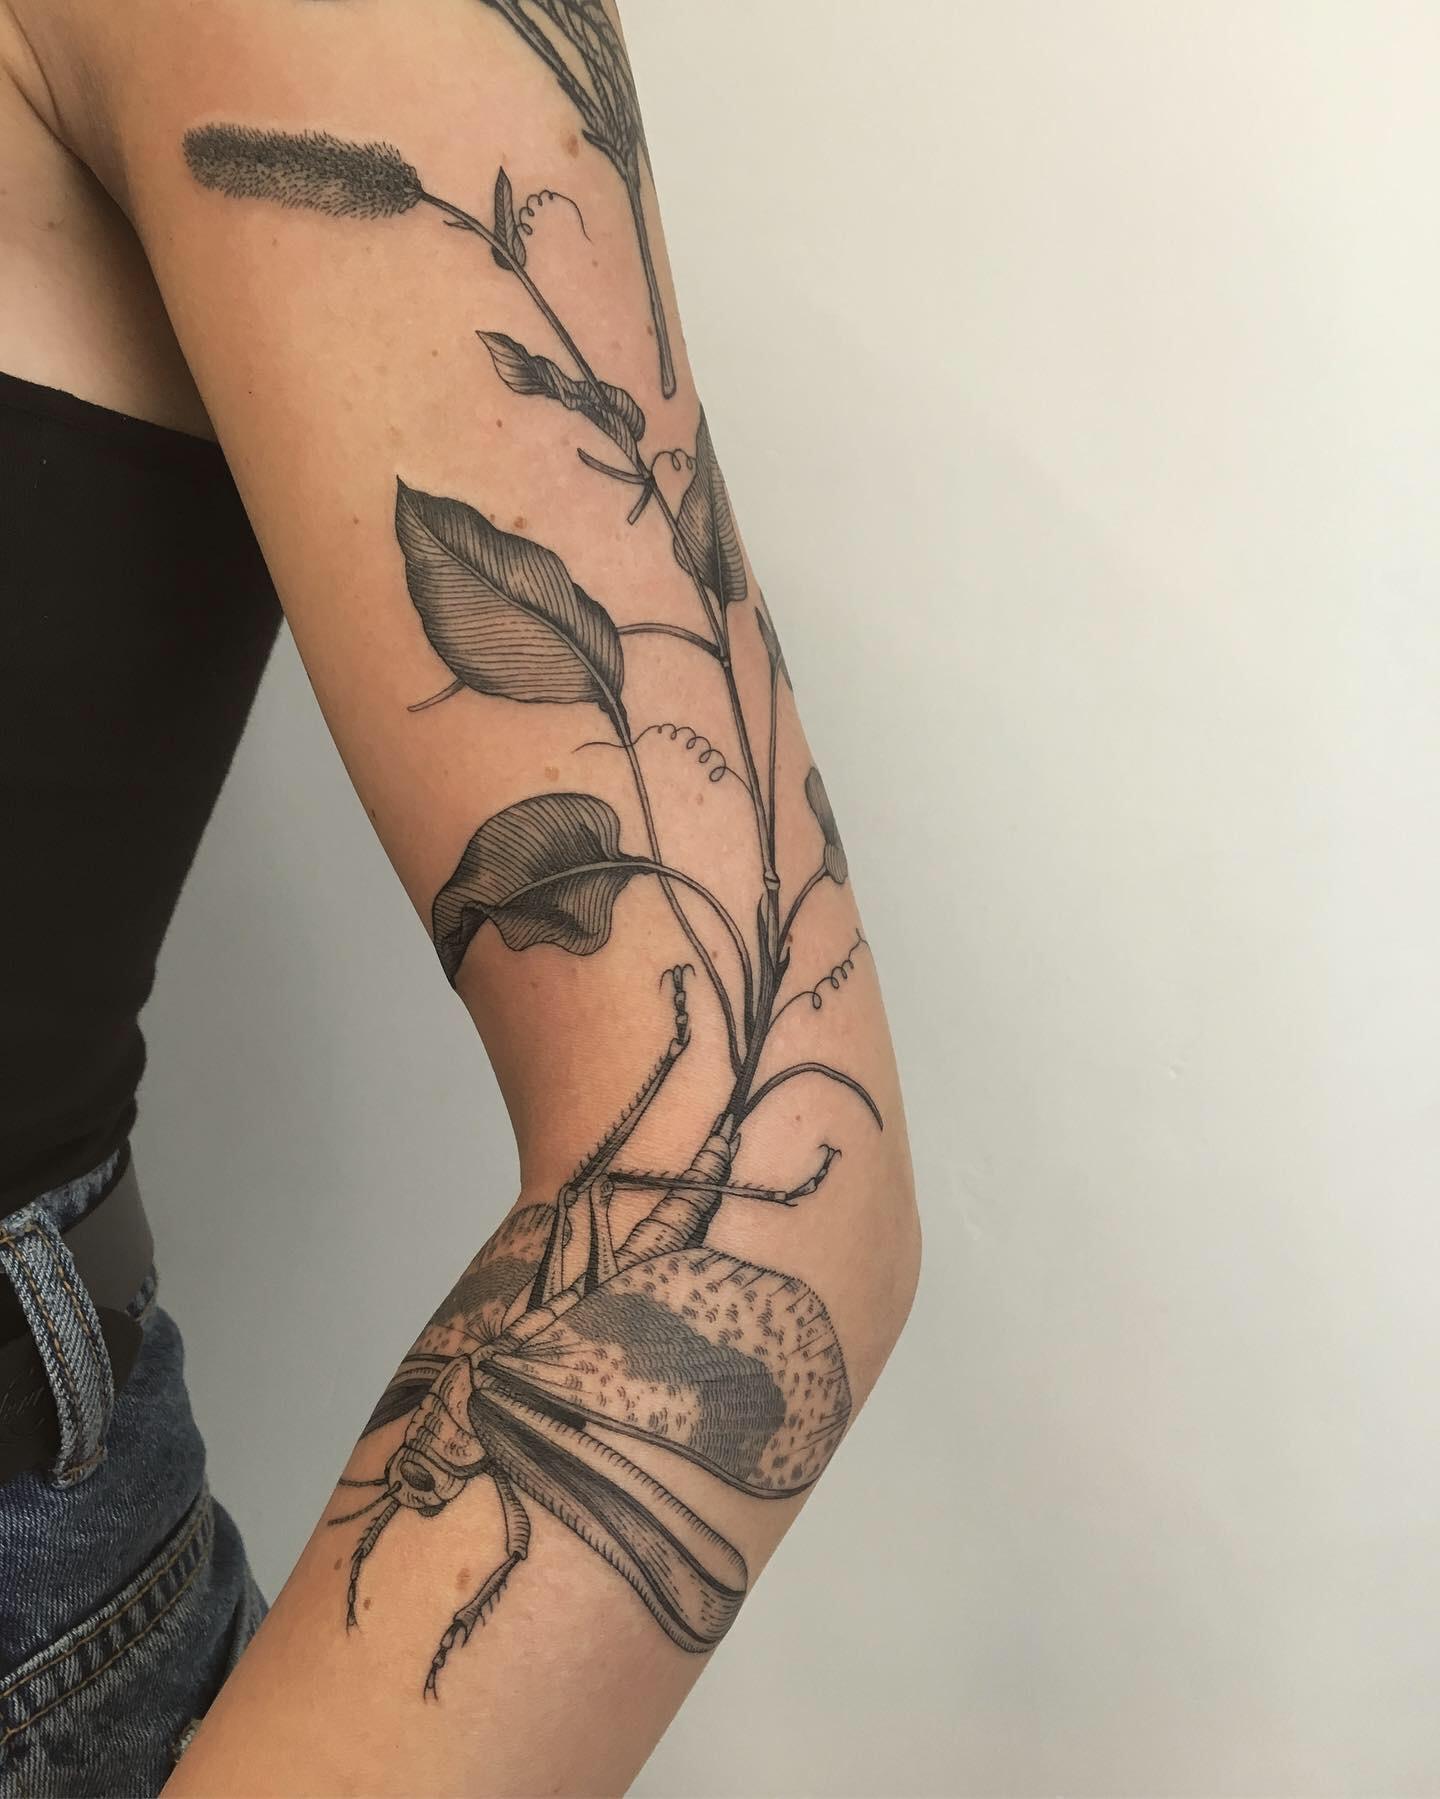 tatuaggini_intervista_firenze_matteo_masini